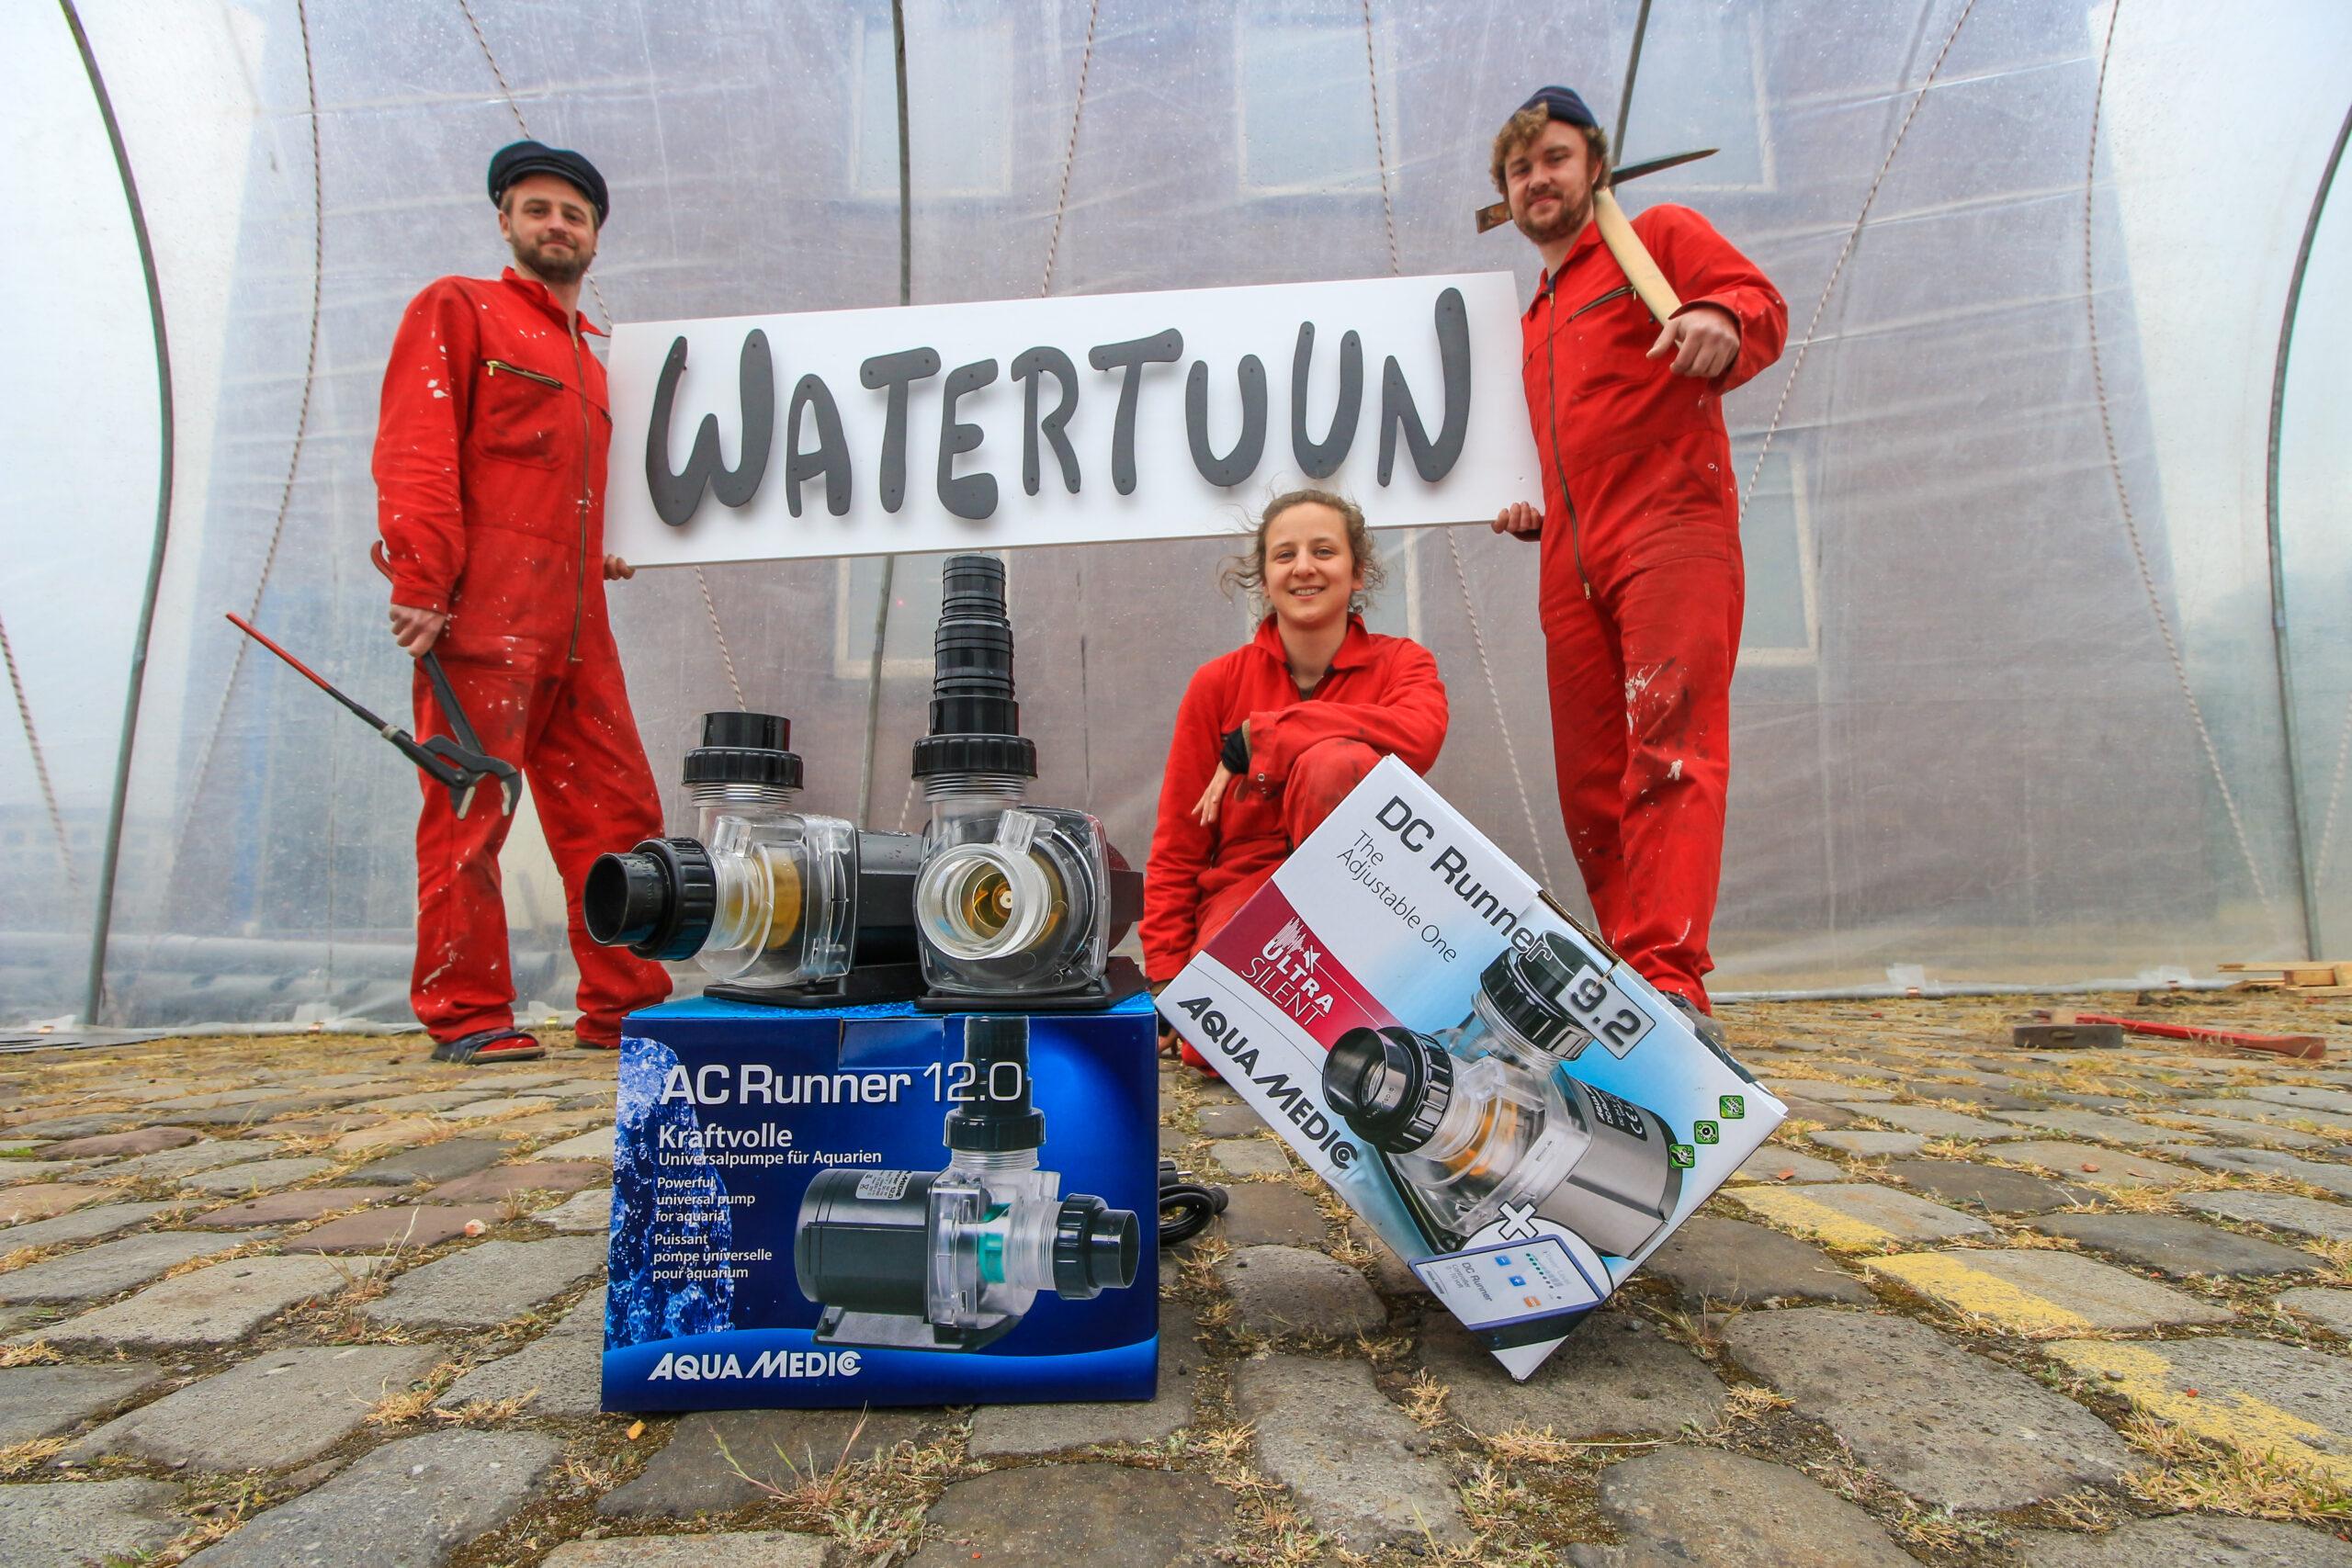 Watertuun_Aquaponik_Sponsor_AquaMedic